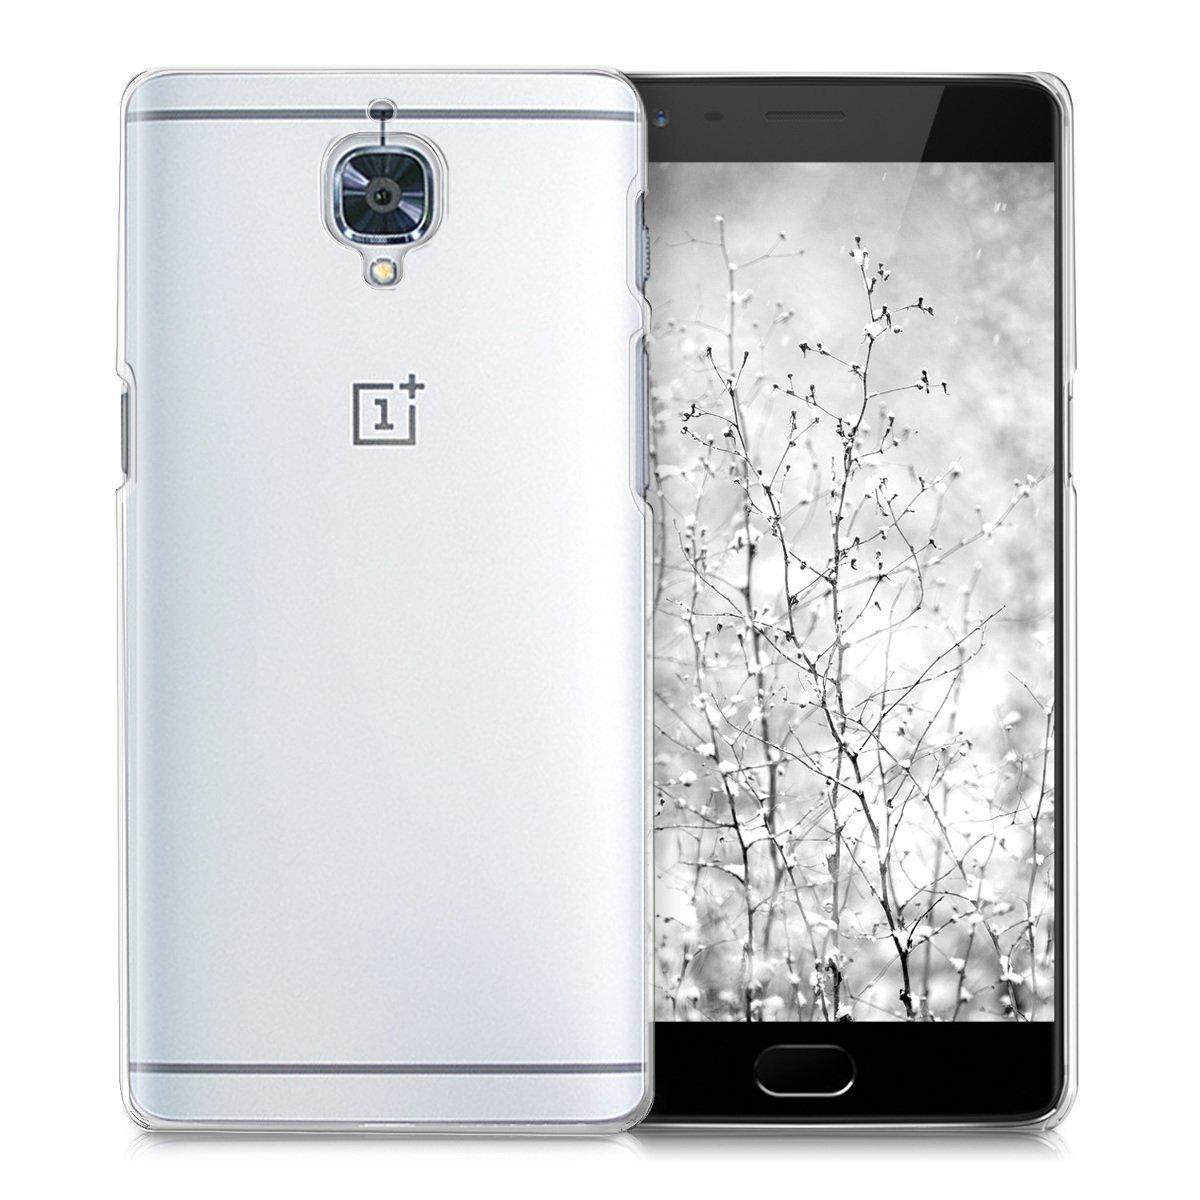 Hoesje OnePlus 3 hard case transparant